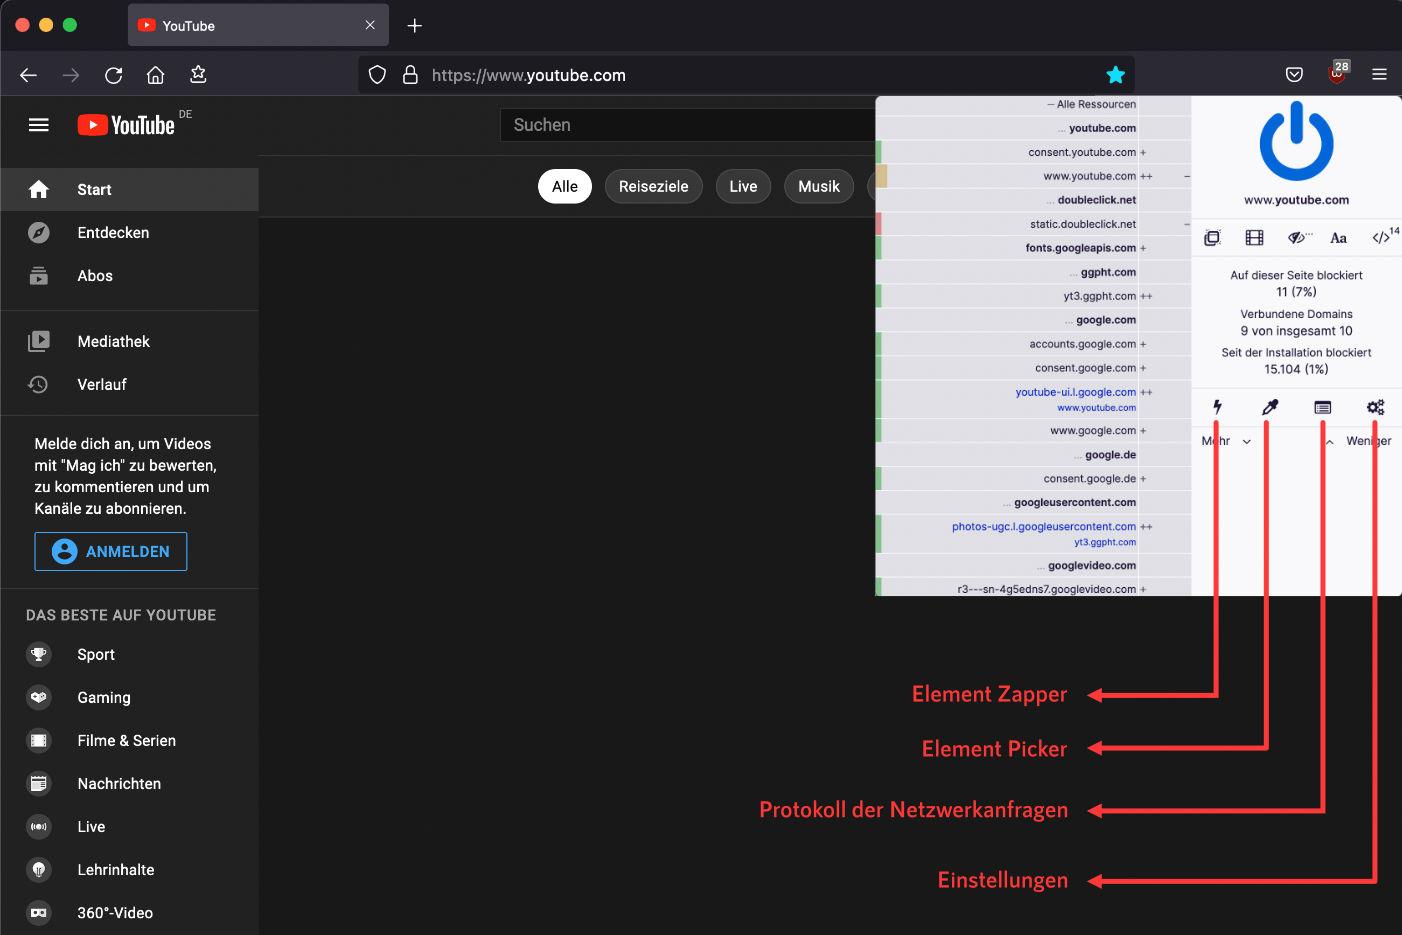 uBlock Origin Popup User Interface